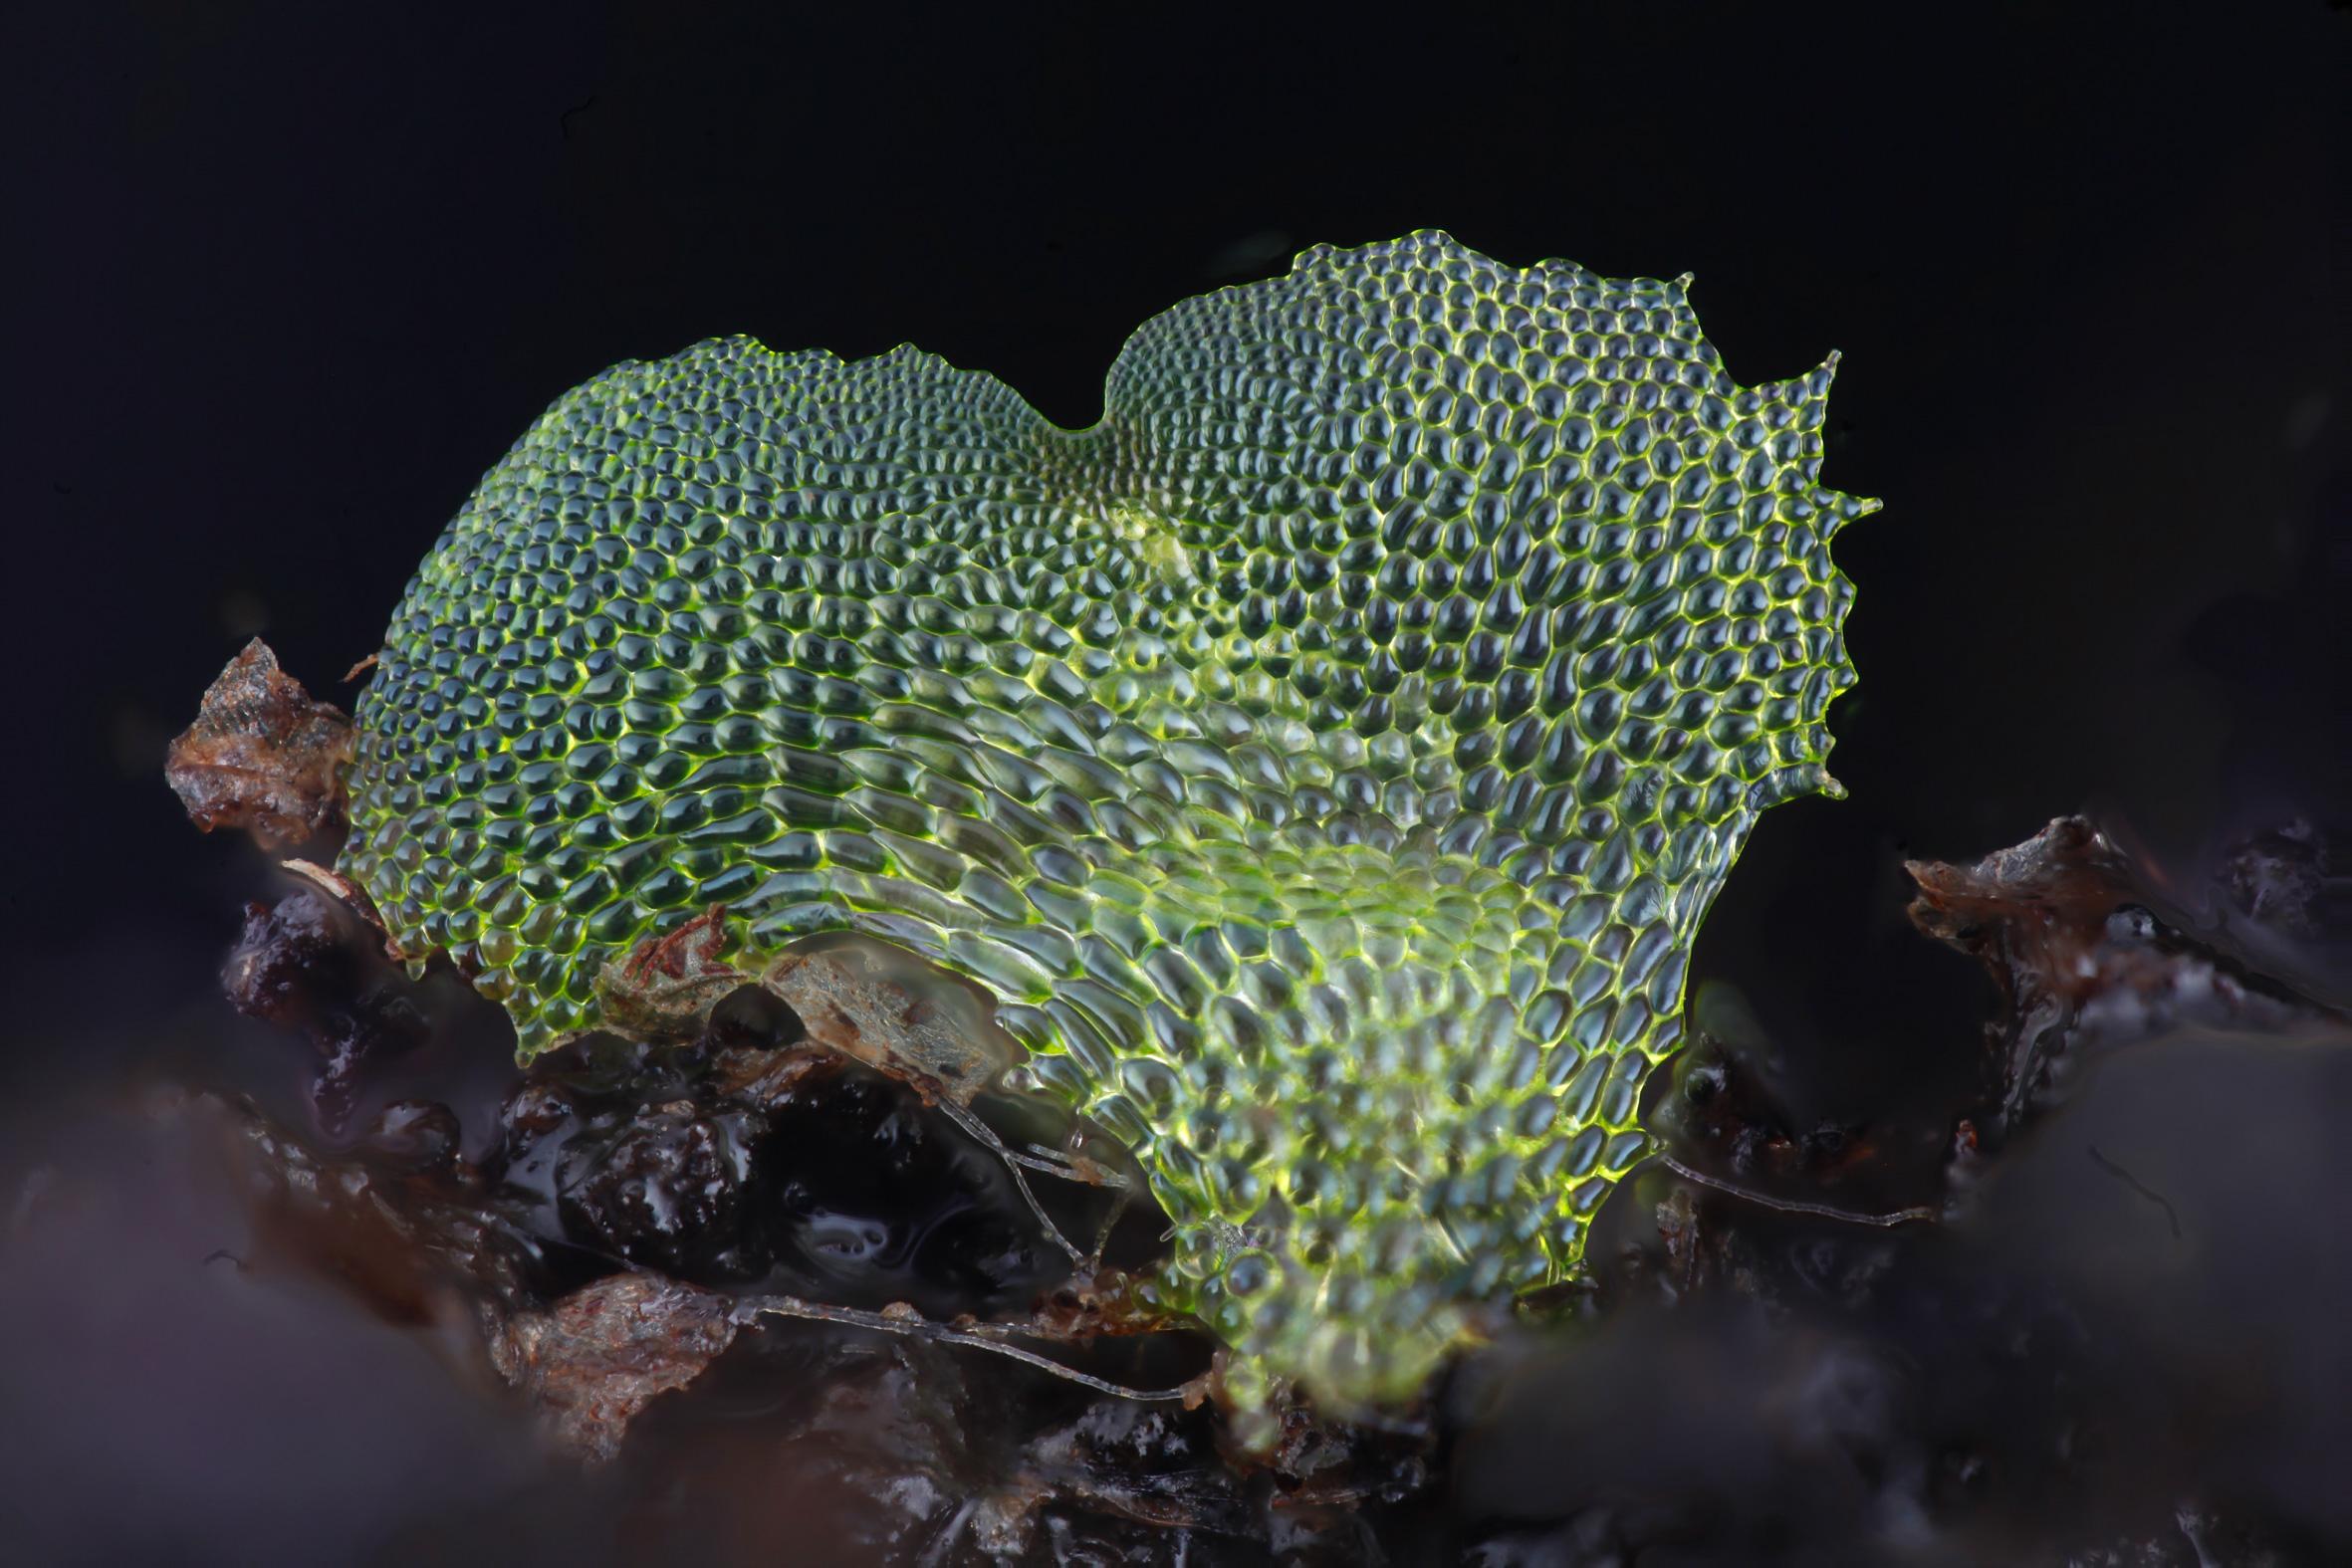 Asplenium scolopendrium gametophytes (ferns)